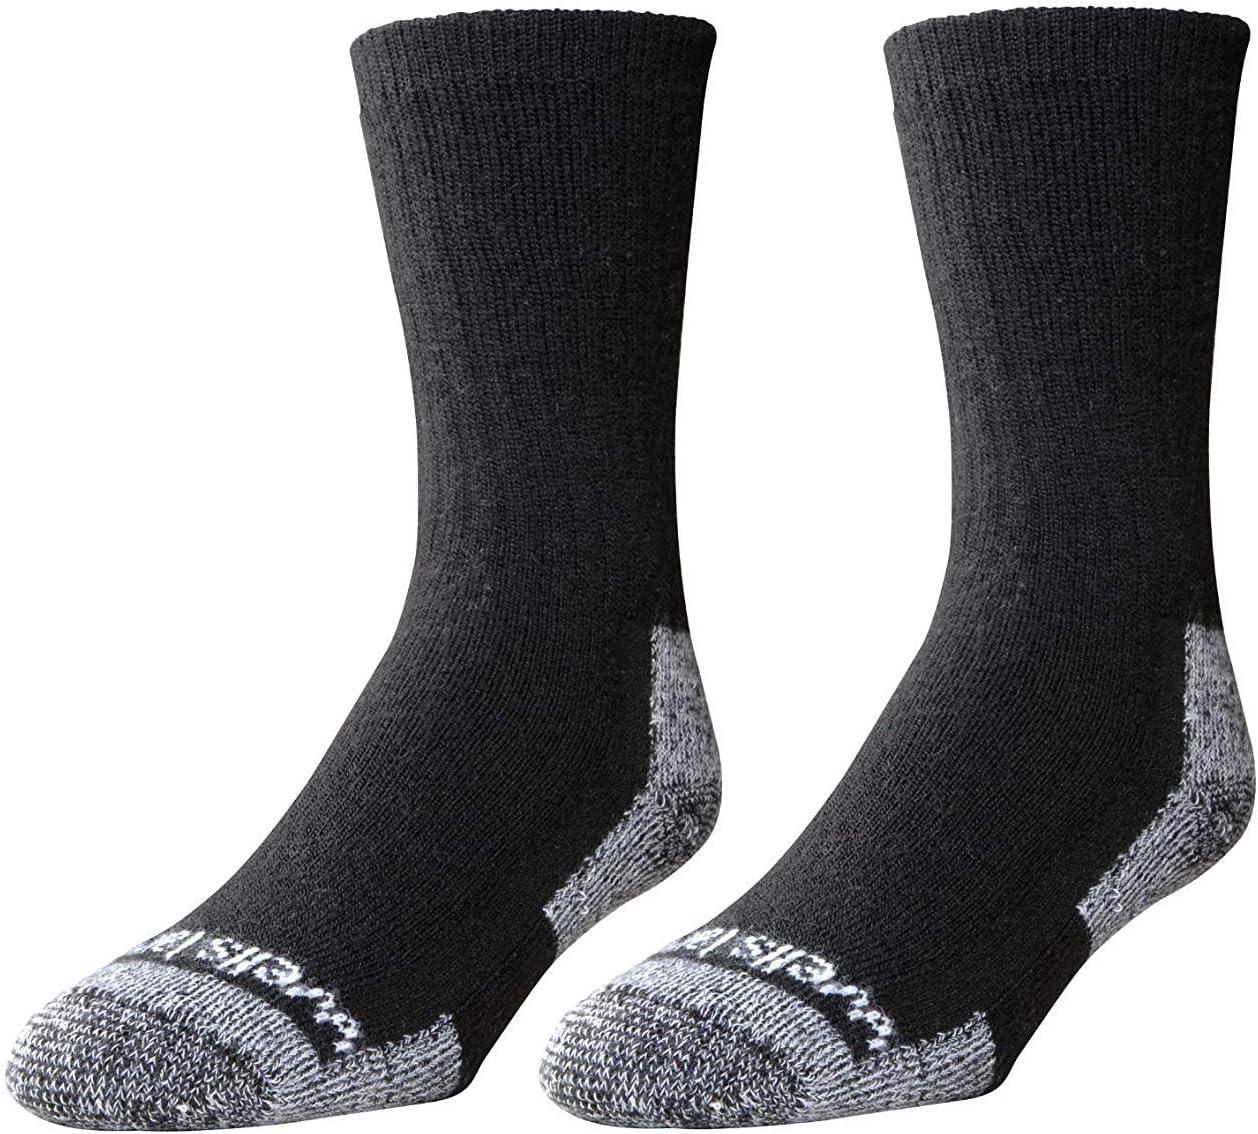 2-Pair Pack Wells Lamont 4 years warranty Men's Socks: Black Blend Wool Max 50% OFF Crew